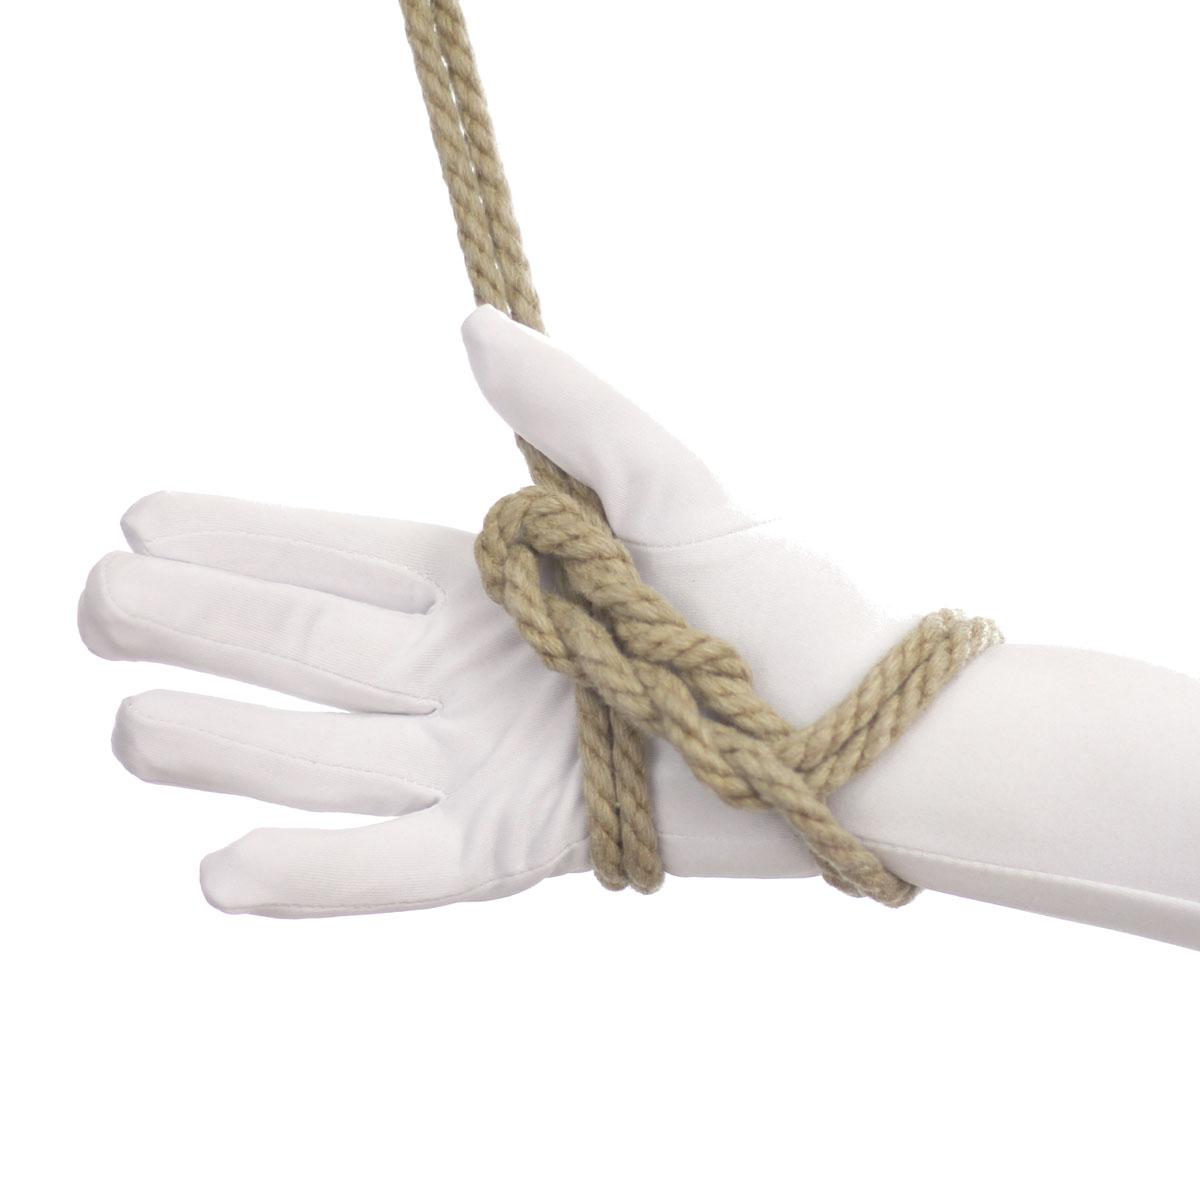 Flogging-Cuff